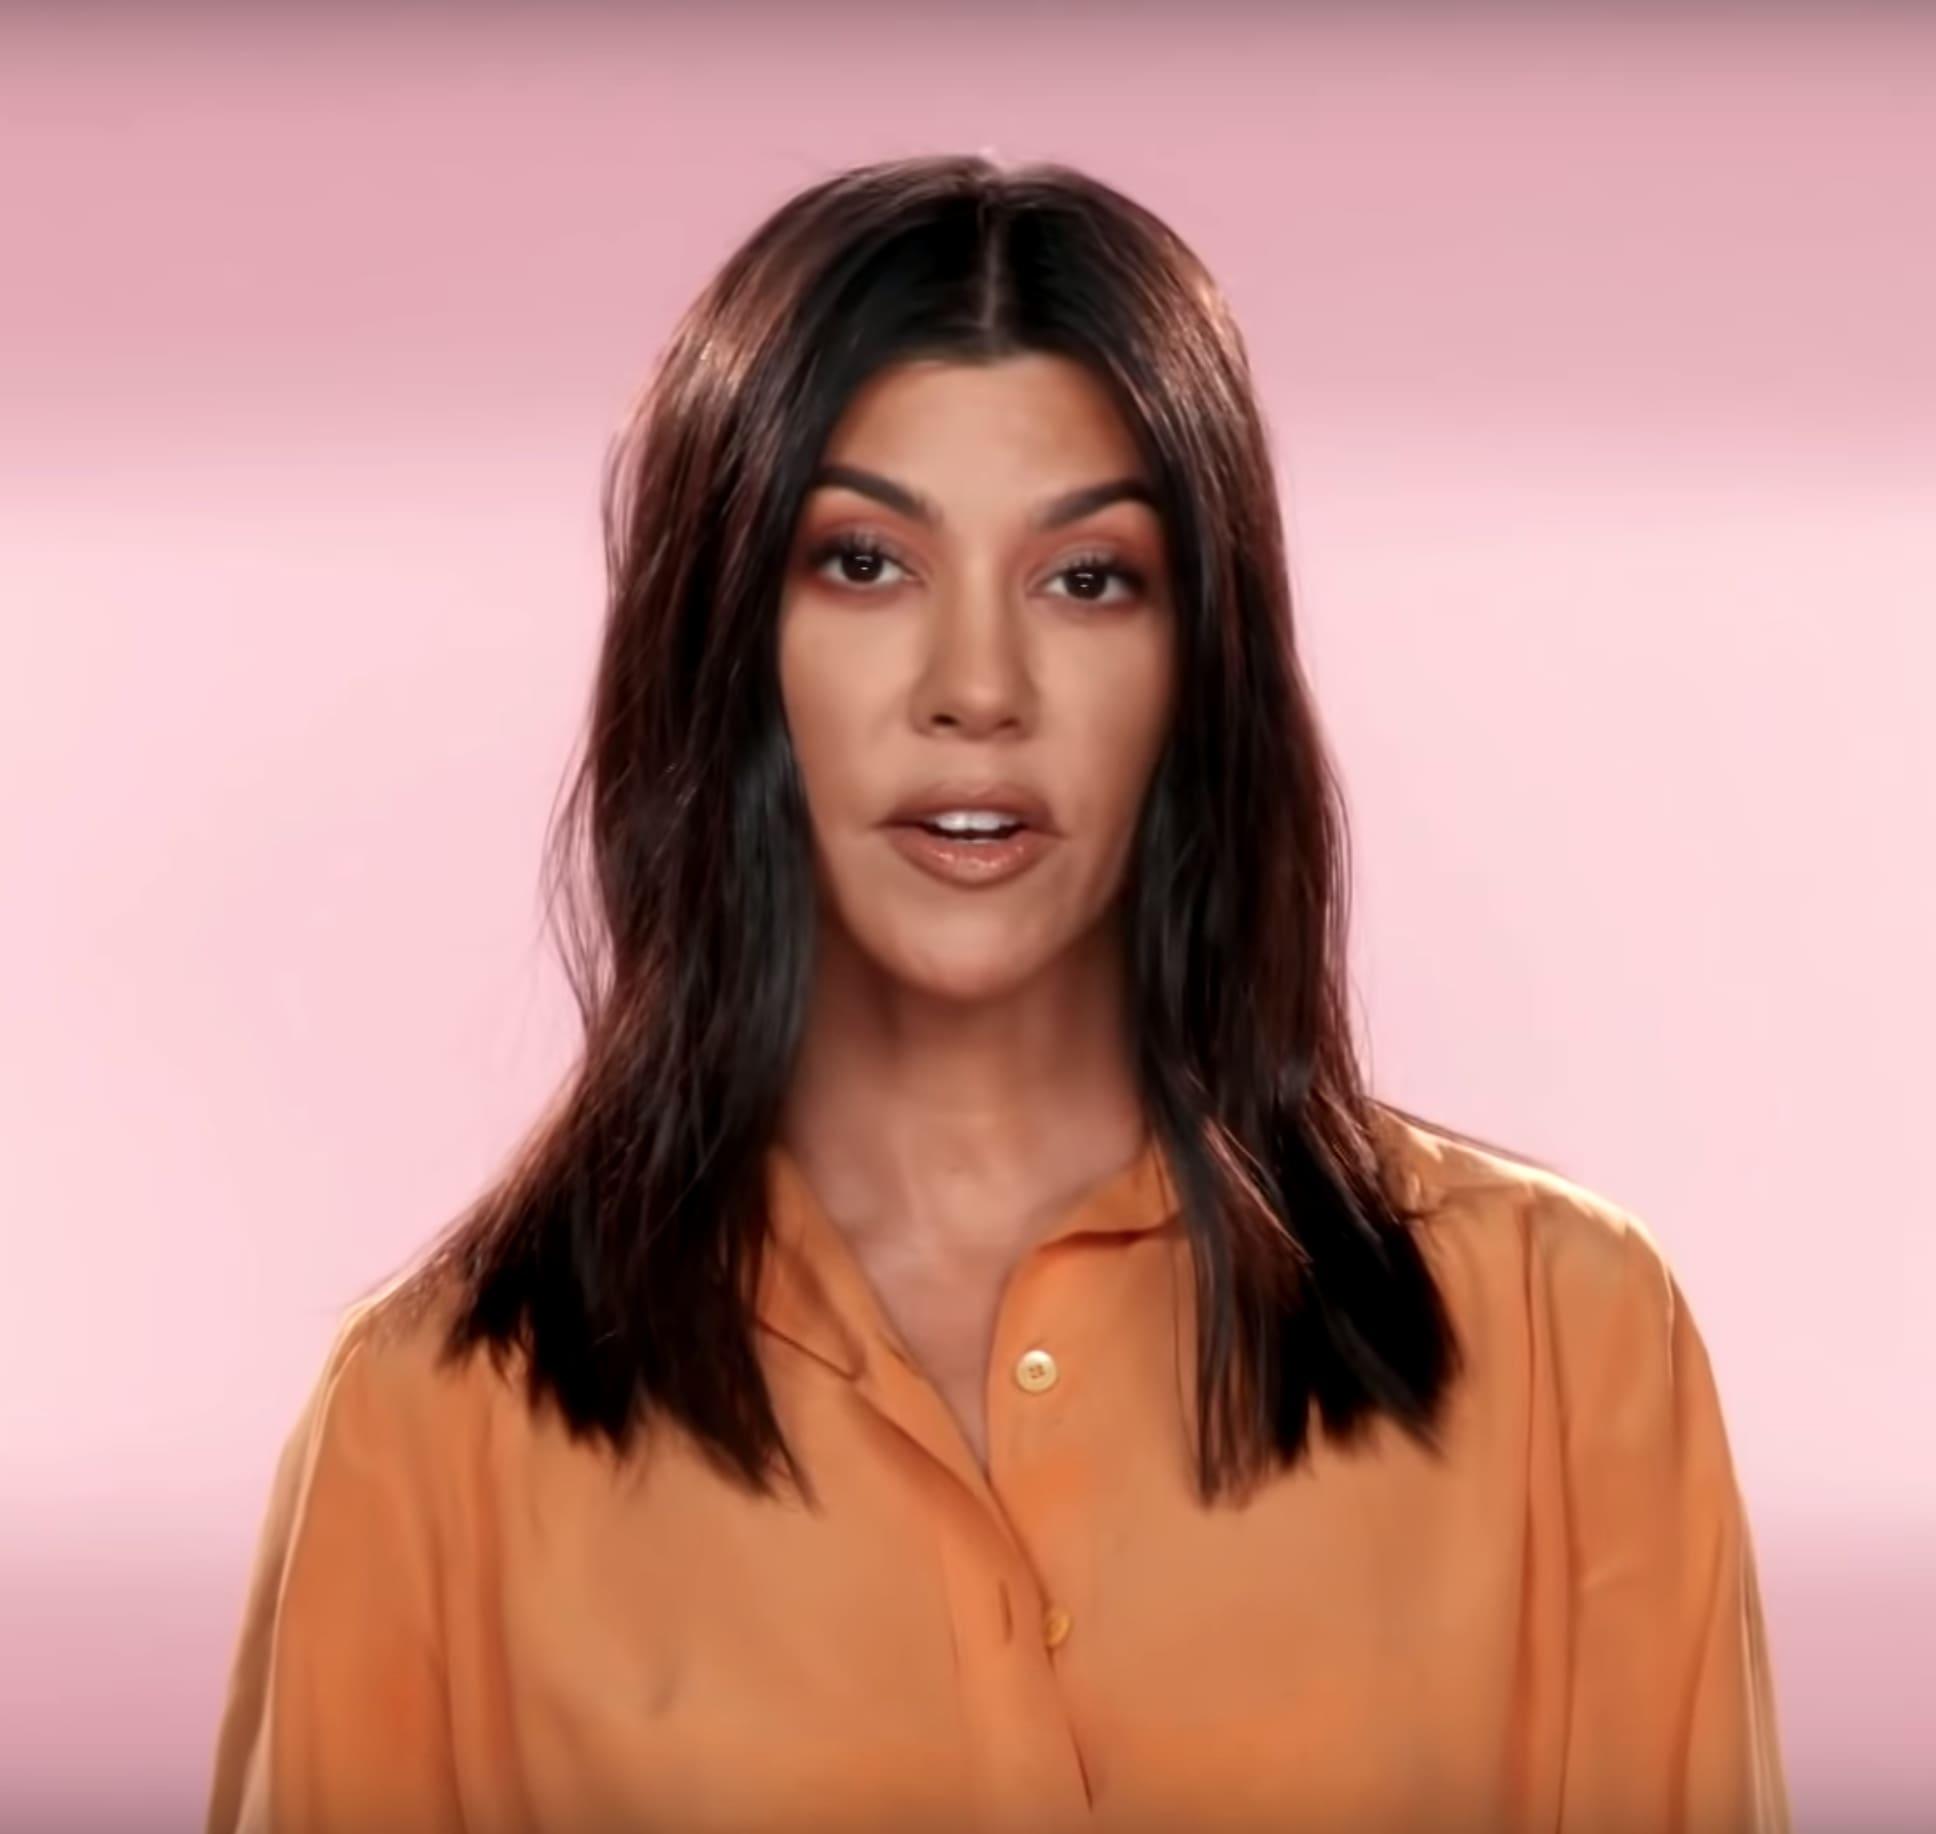 khloe kardashian season 12